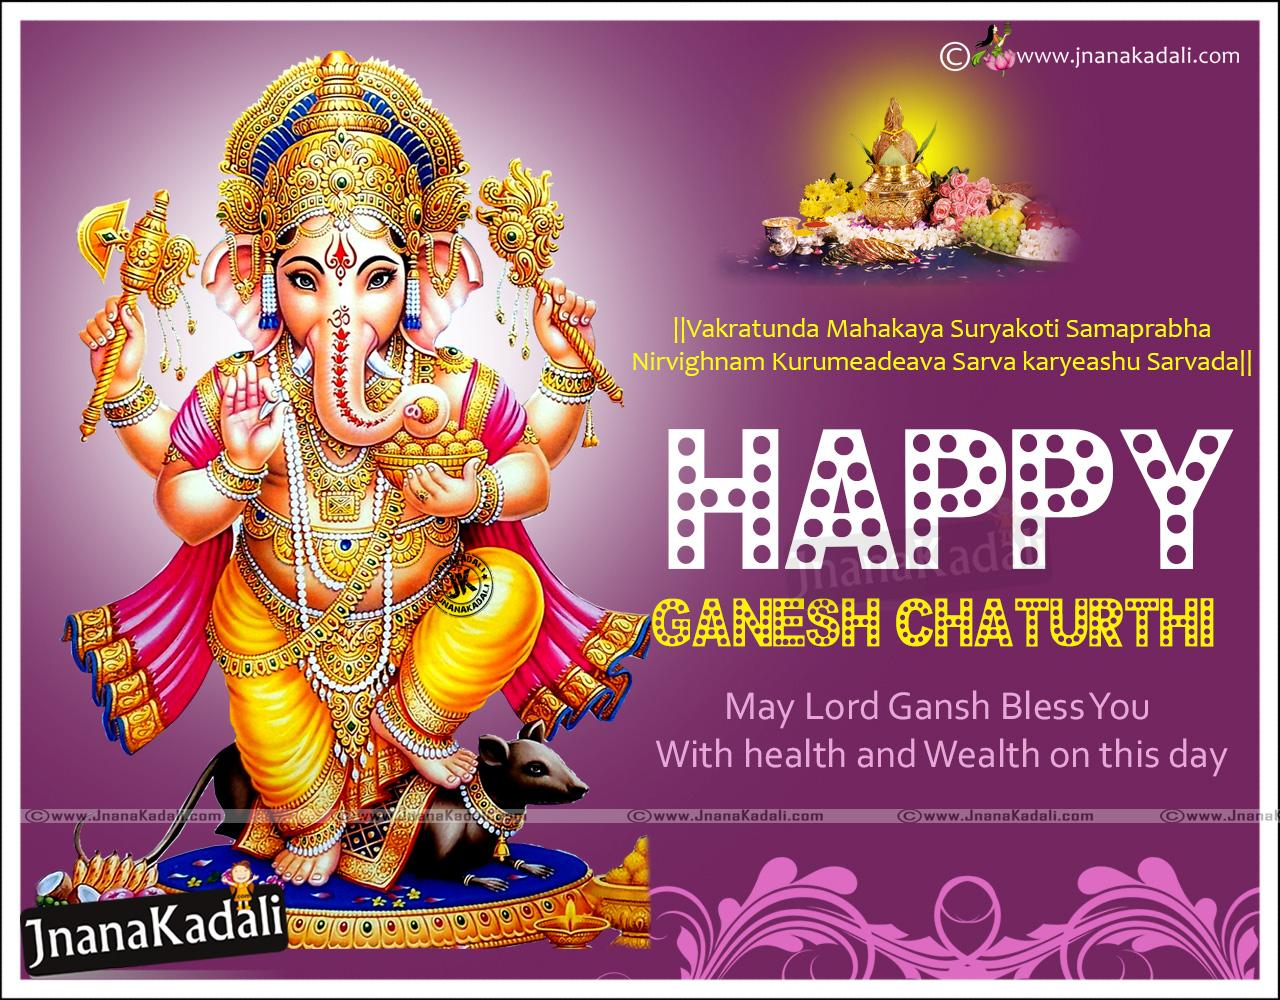 Ganesh chaturthi mp3 songs download in telugu download lorie danse ganesh chaturthi mp3 songs download in telugu m4hsunfo Gallery